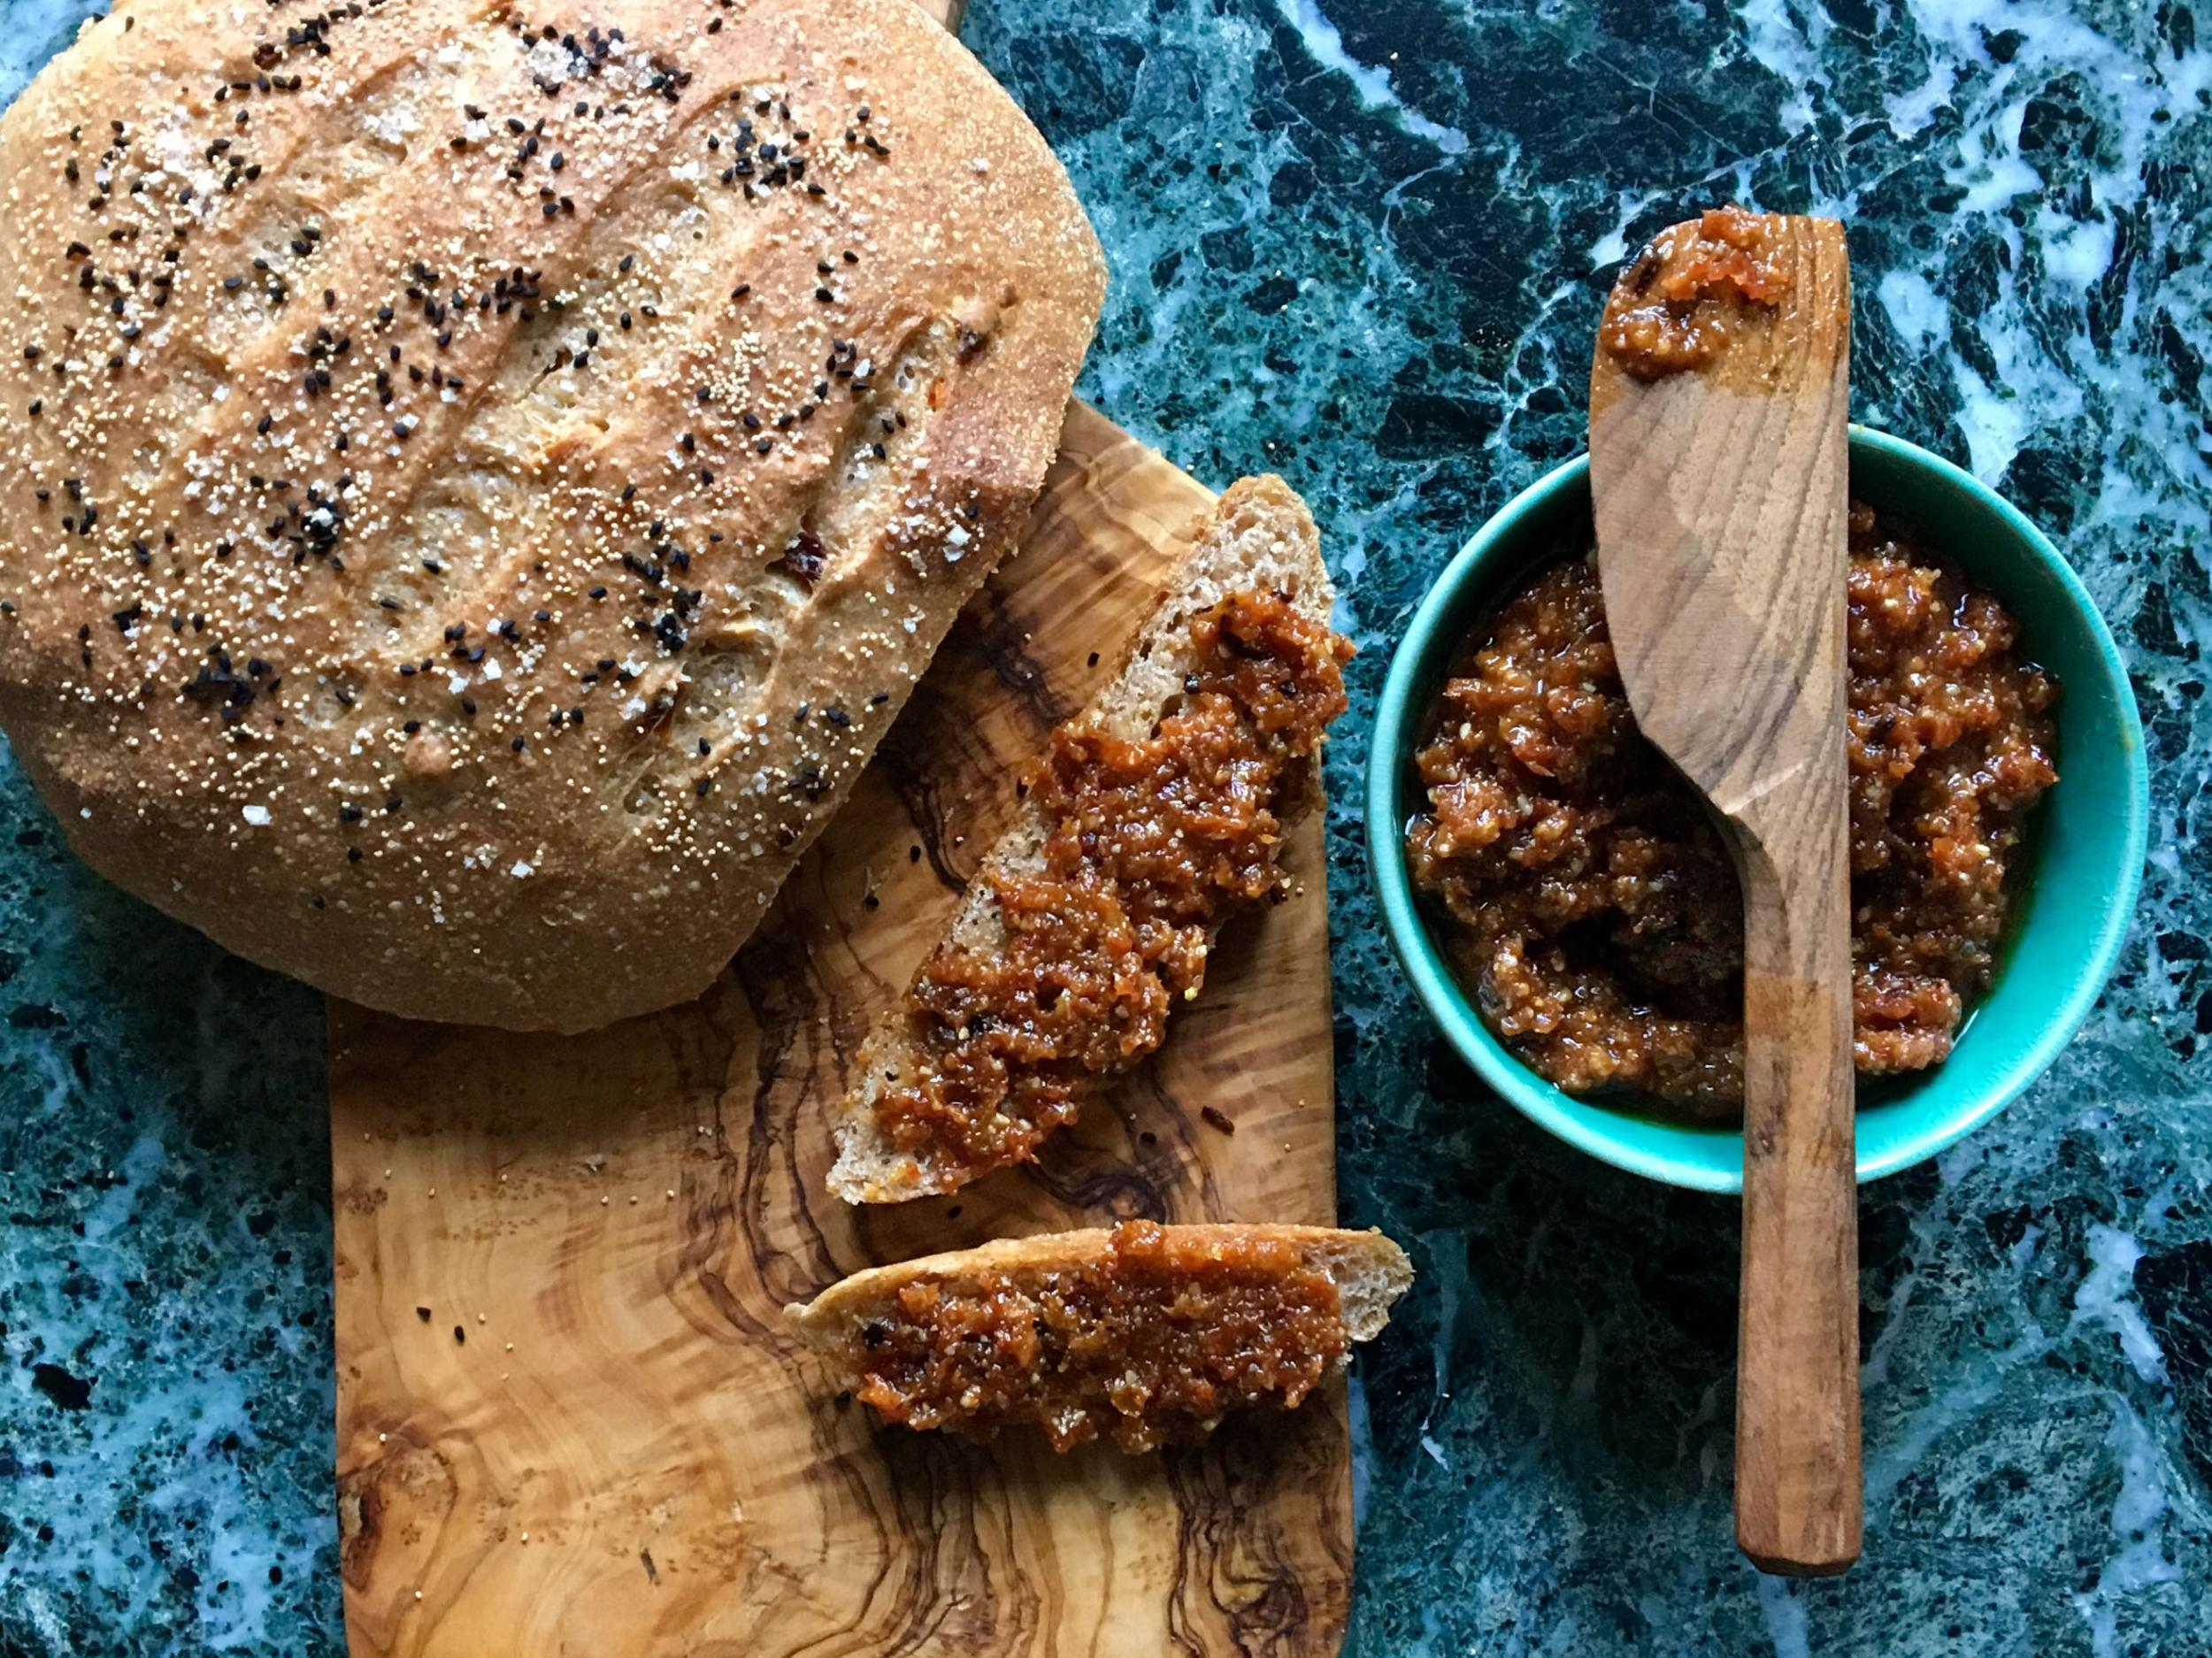 How to make sun-dried tomato, walnut and chipotle chilli paste